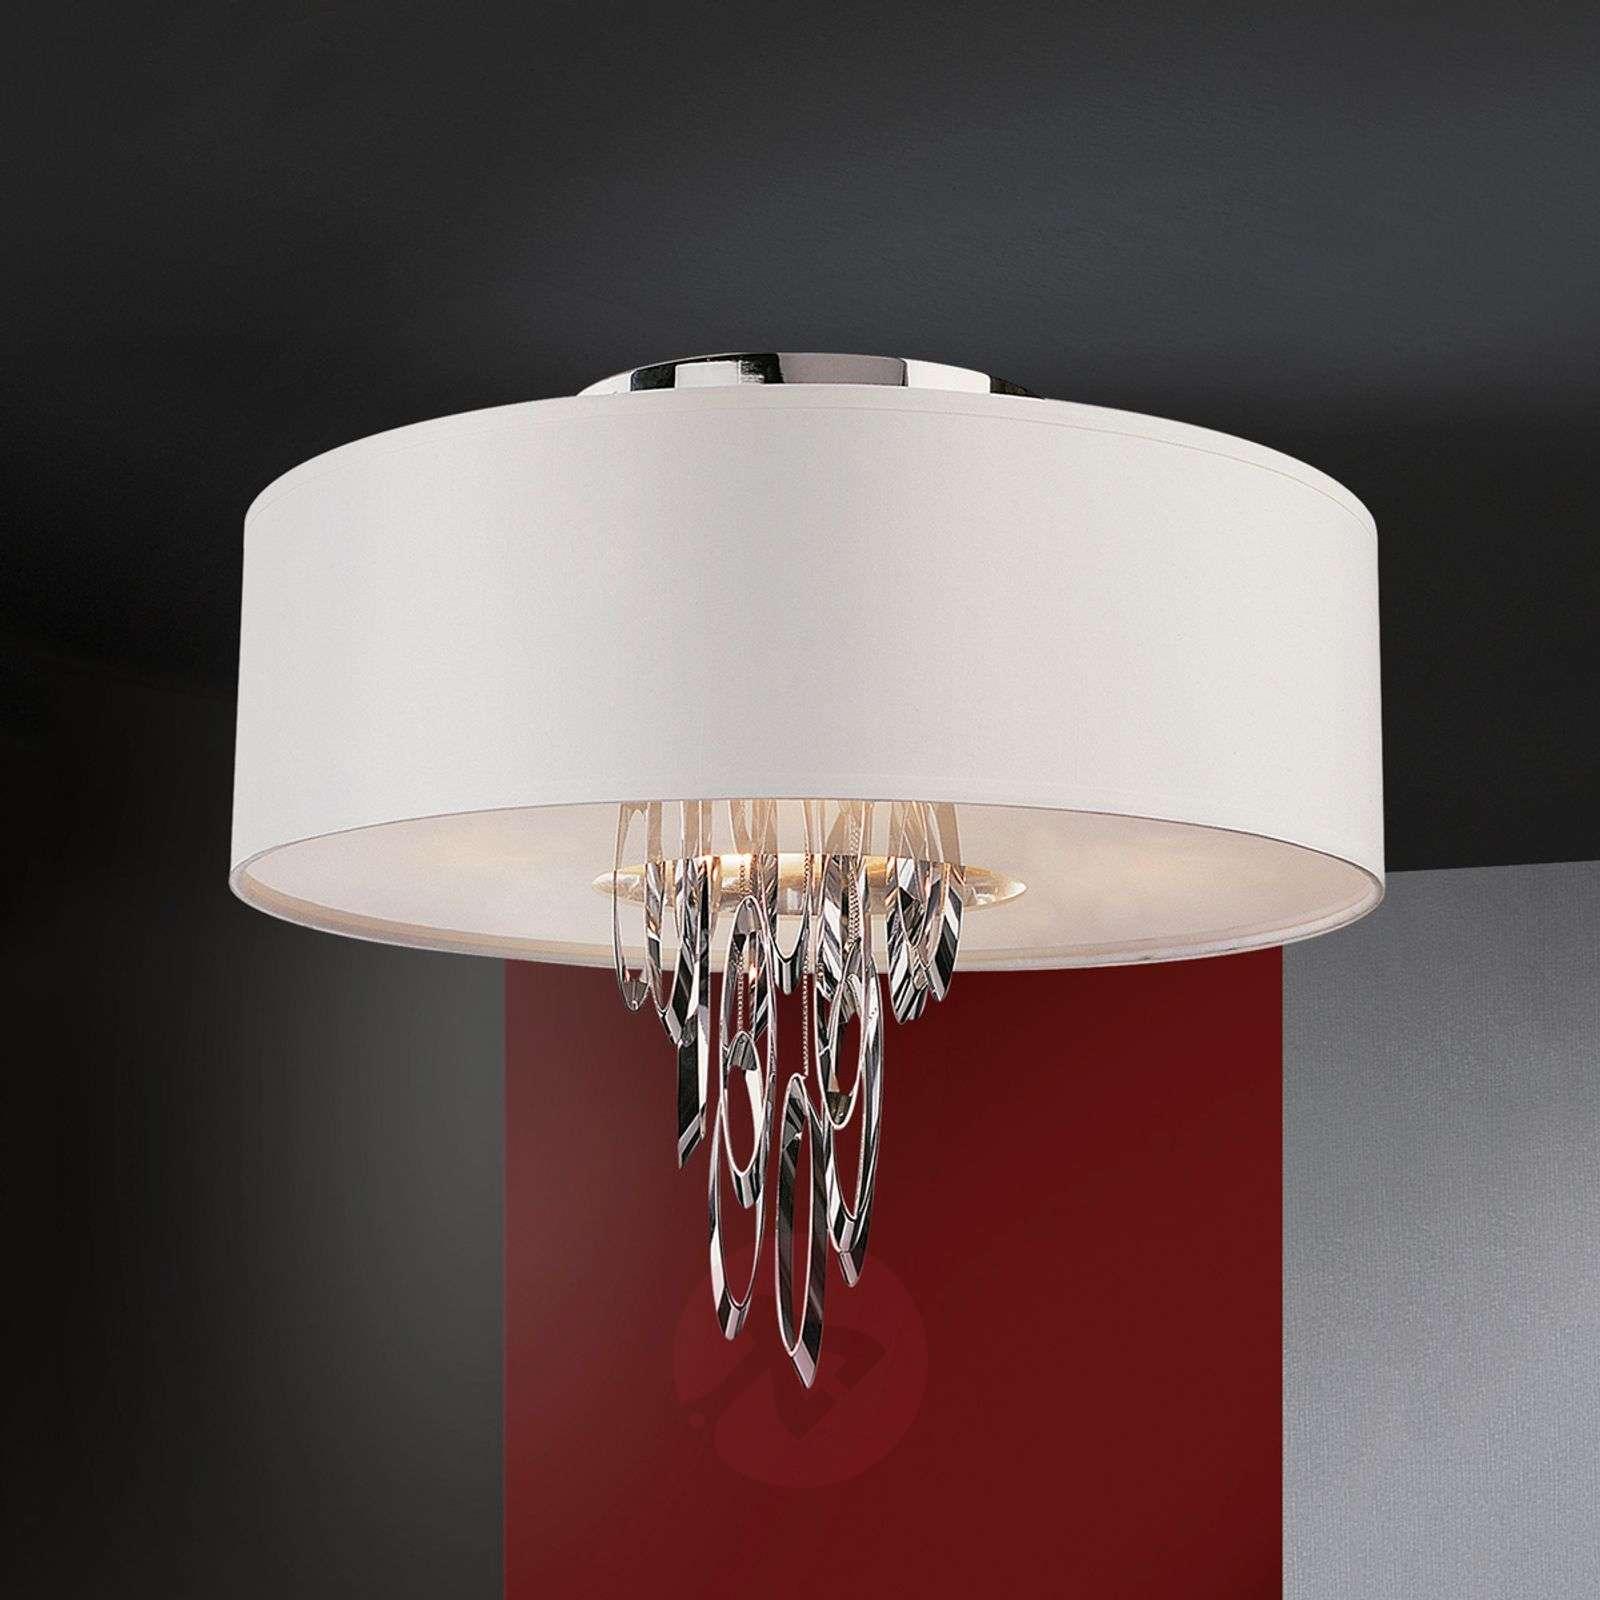 Elegant fabric ceiling light domo lights elegant fabric ceiling light domo 8582245 01 mozeypictures Choice Image